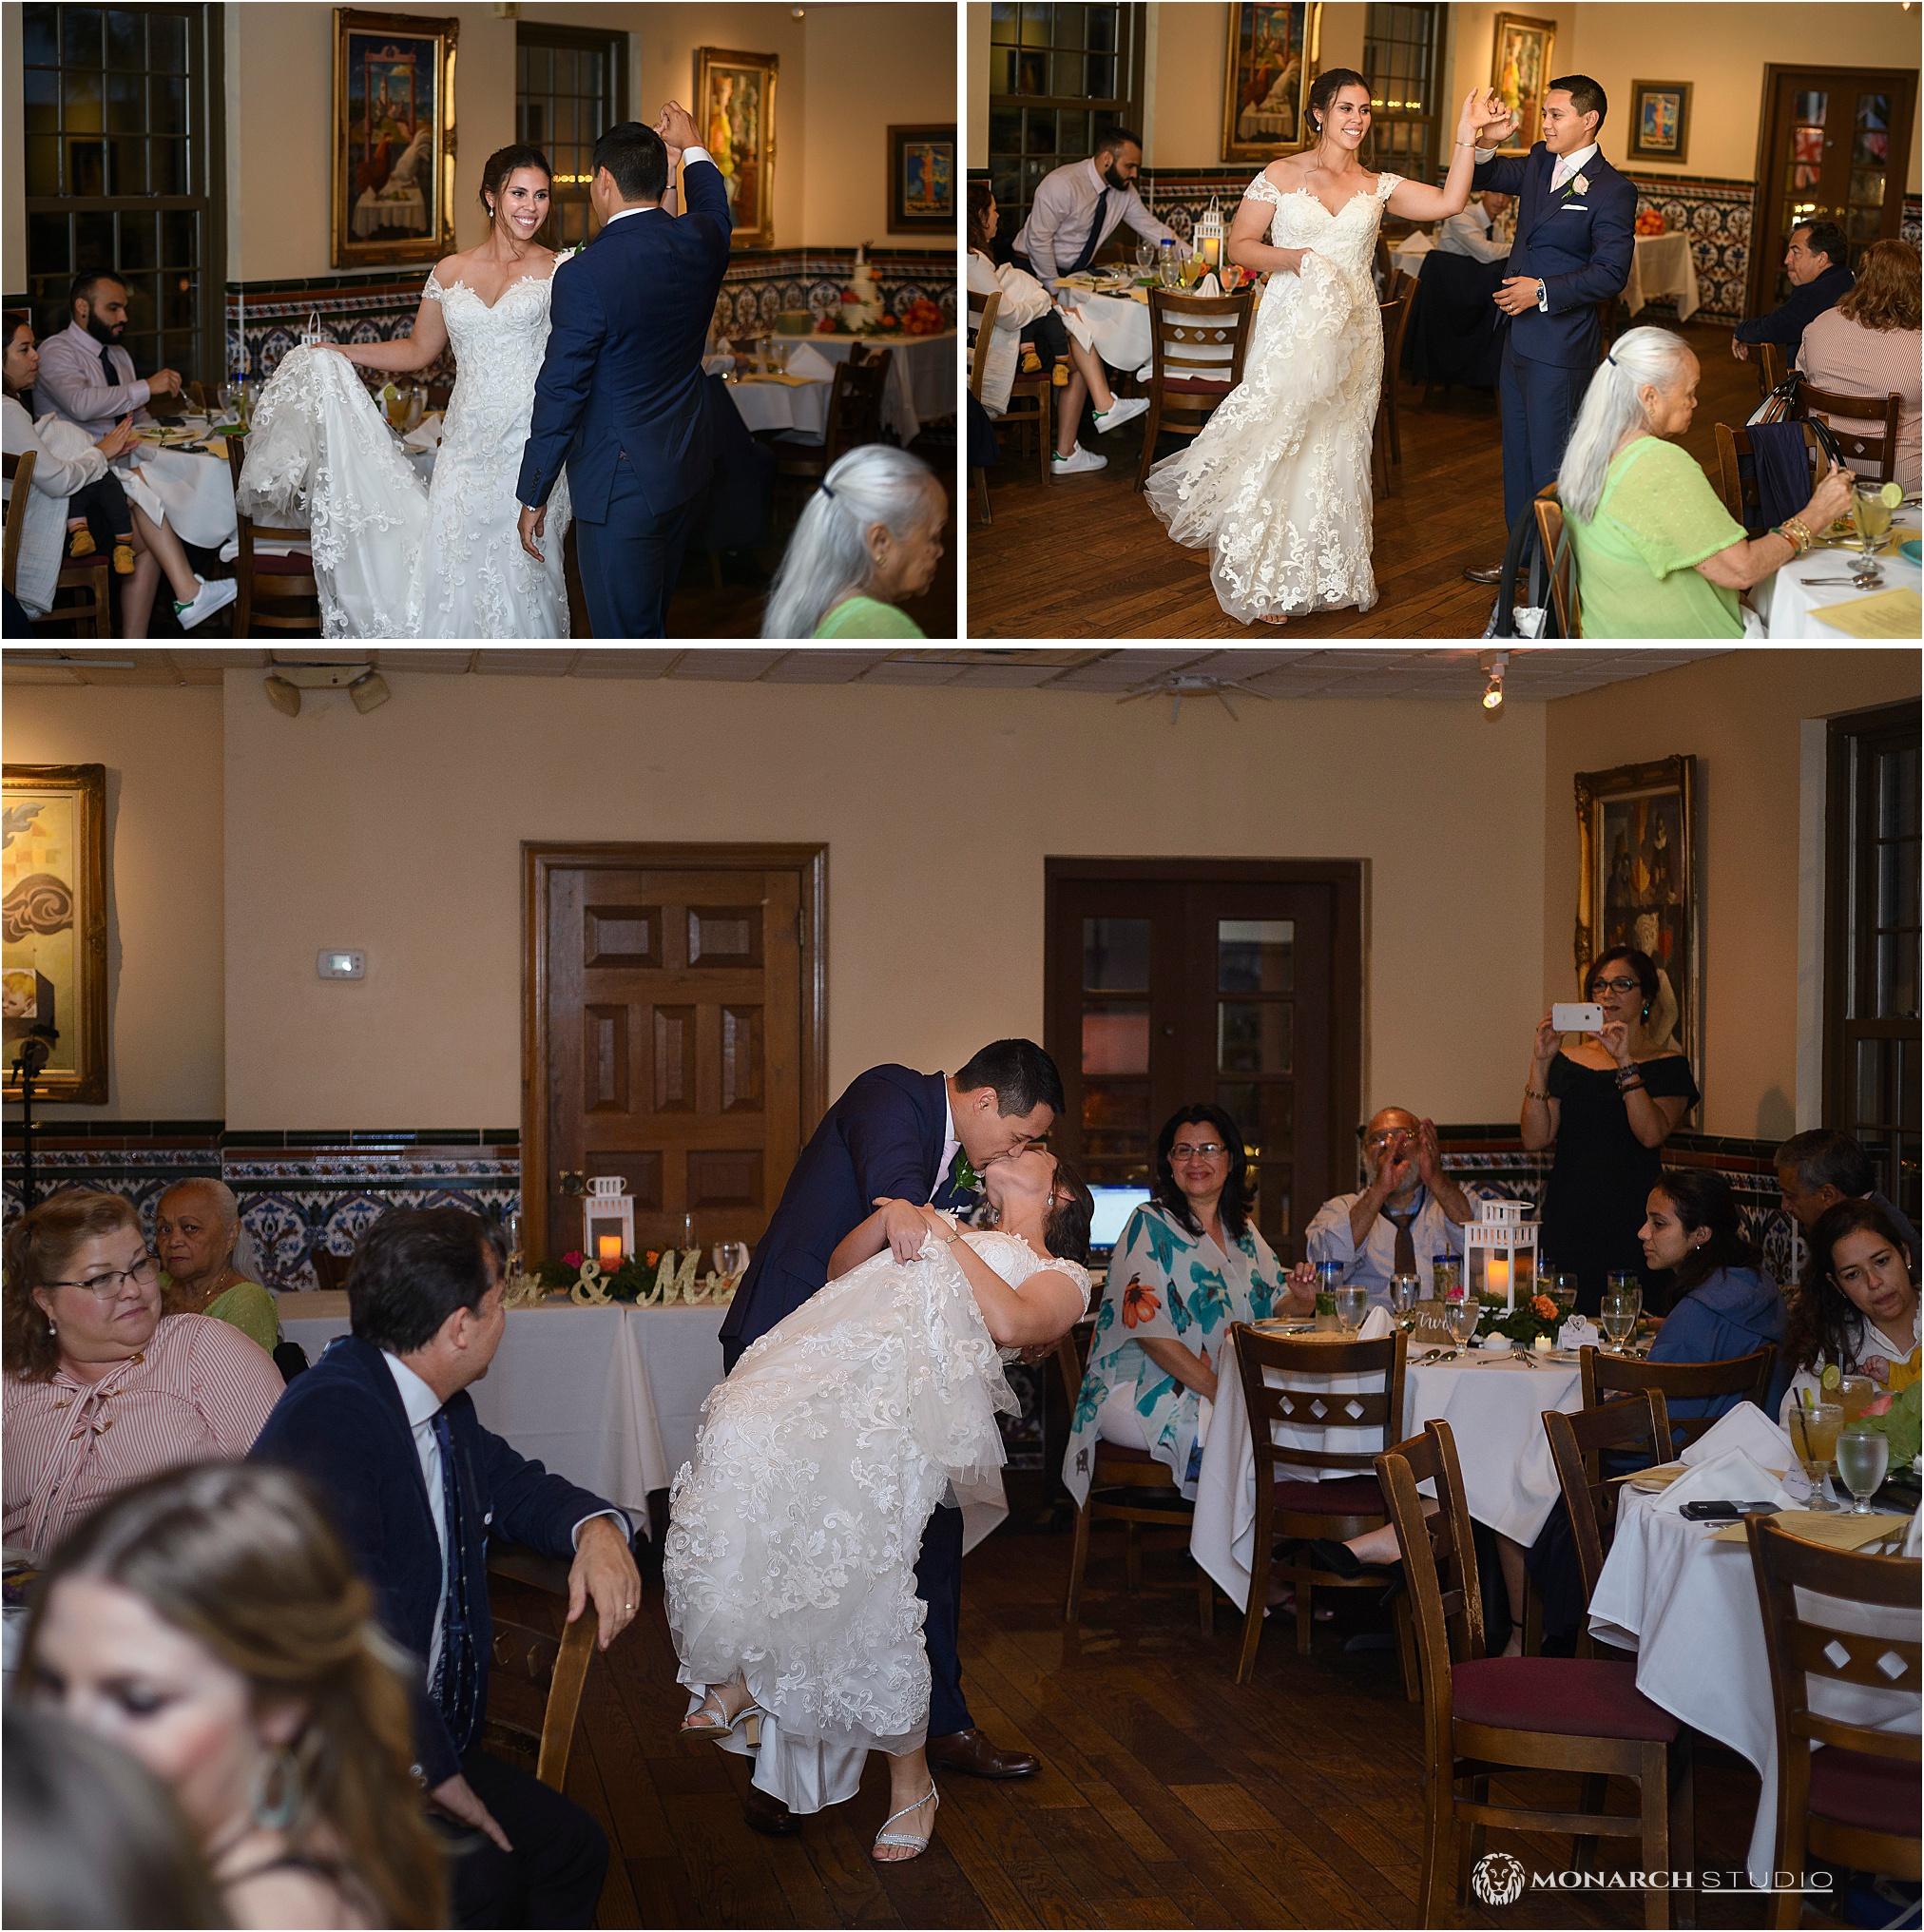 st-augustine-catholic-wedding-075.jpg